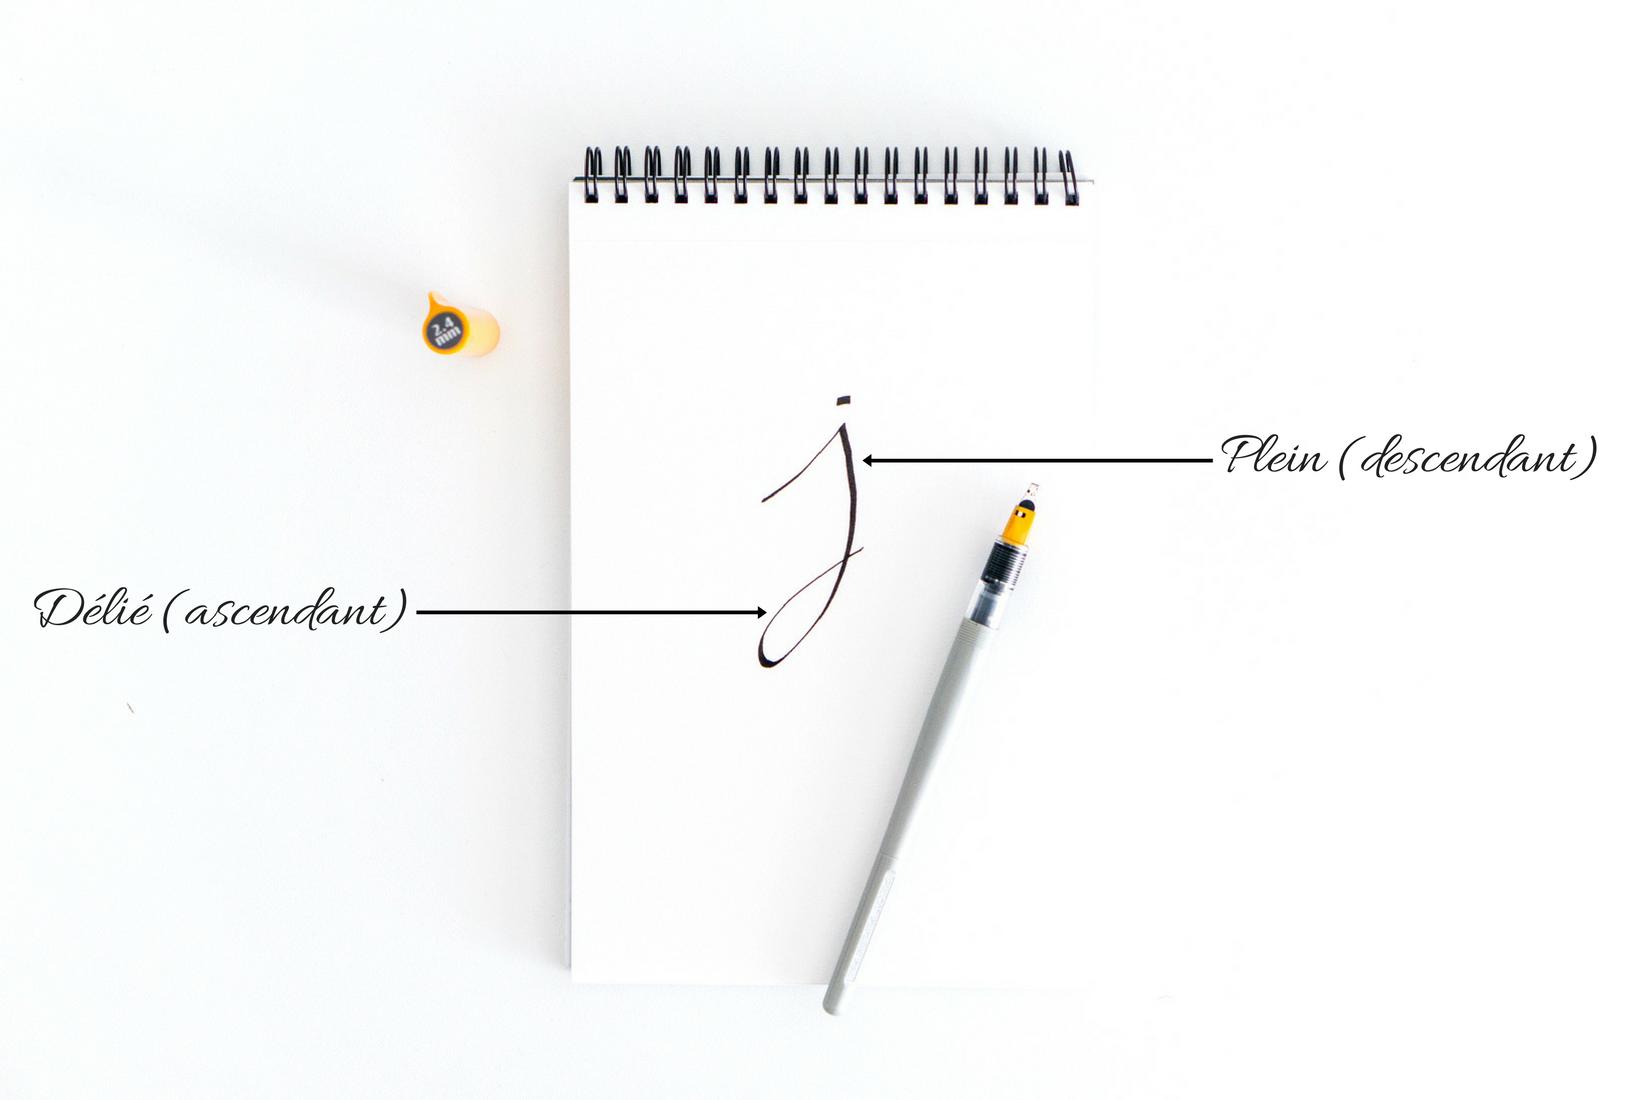 lettre-forme-styloplume-flatlay-calligraphie-hand lettering-tutoriel-oberthur-blog-rennes-lifestyle